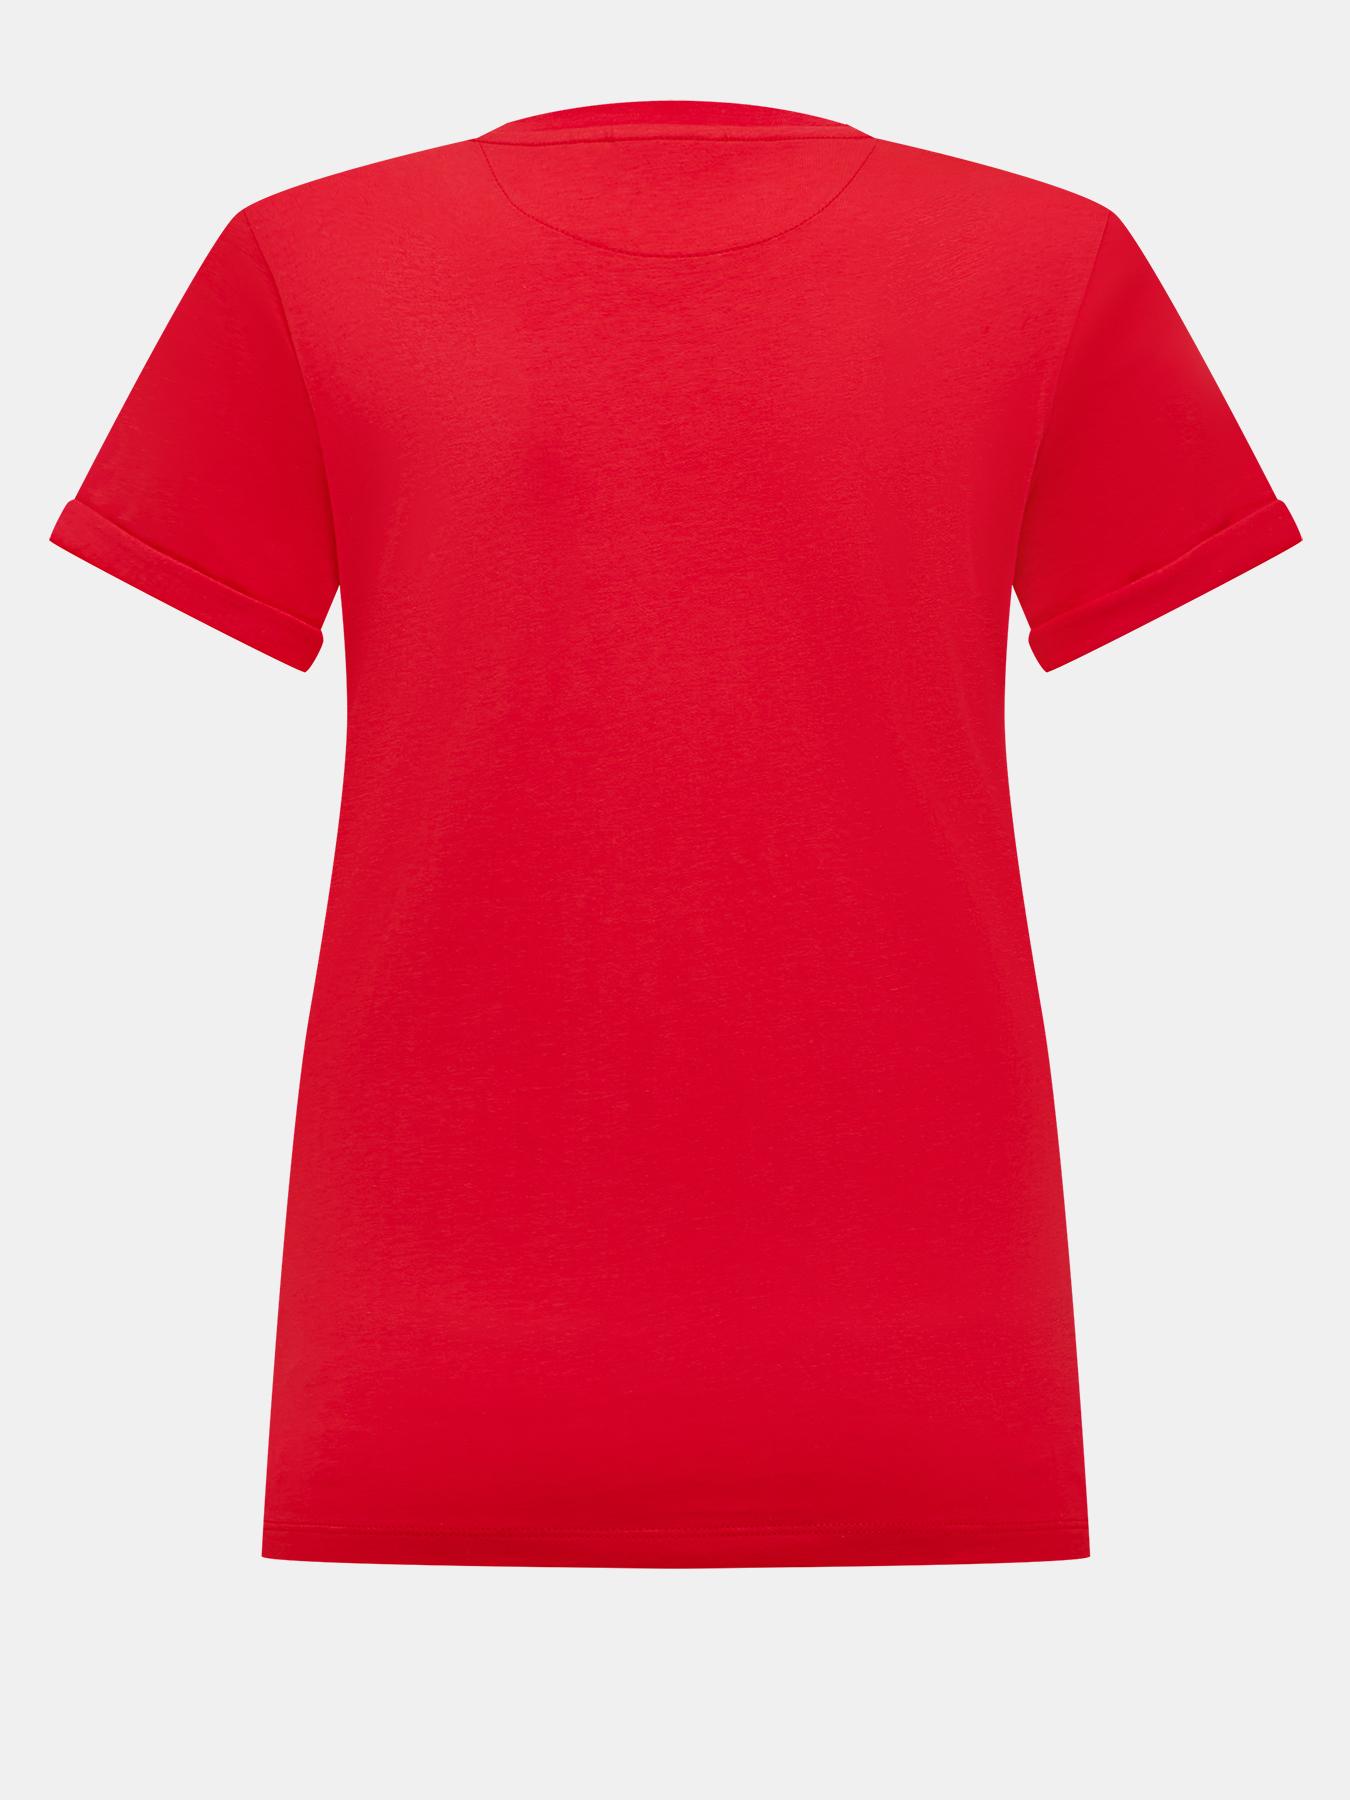 Фуфайка (футболка) HUGO Футболка The Slim Tee